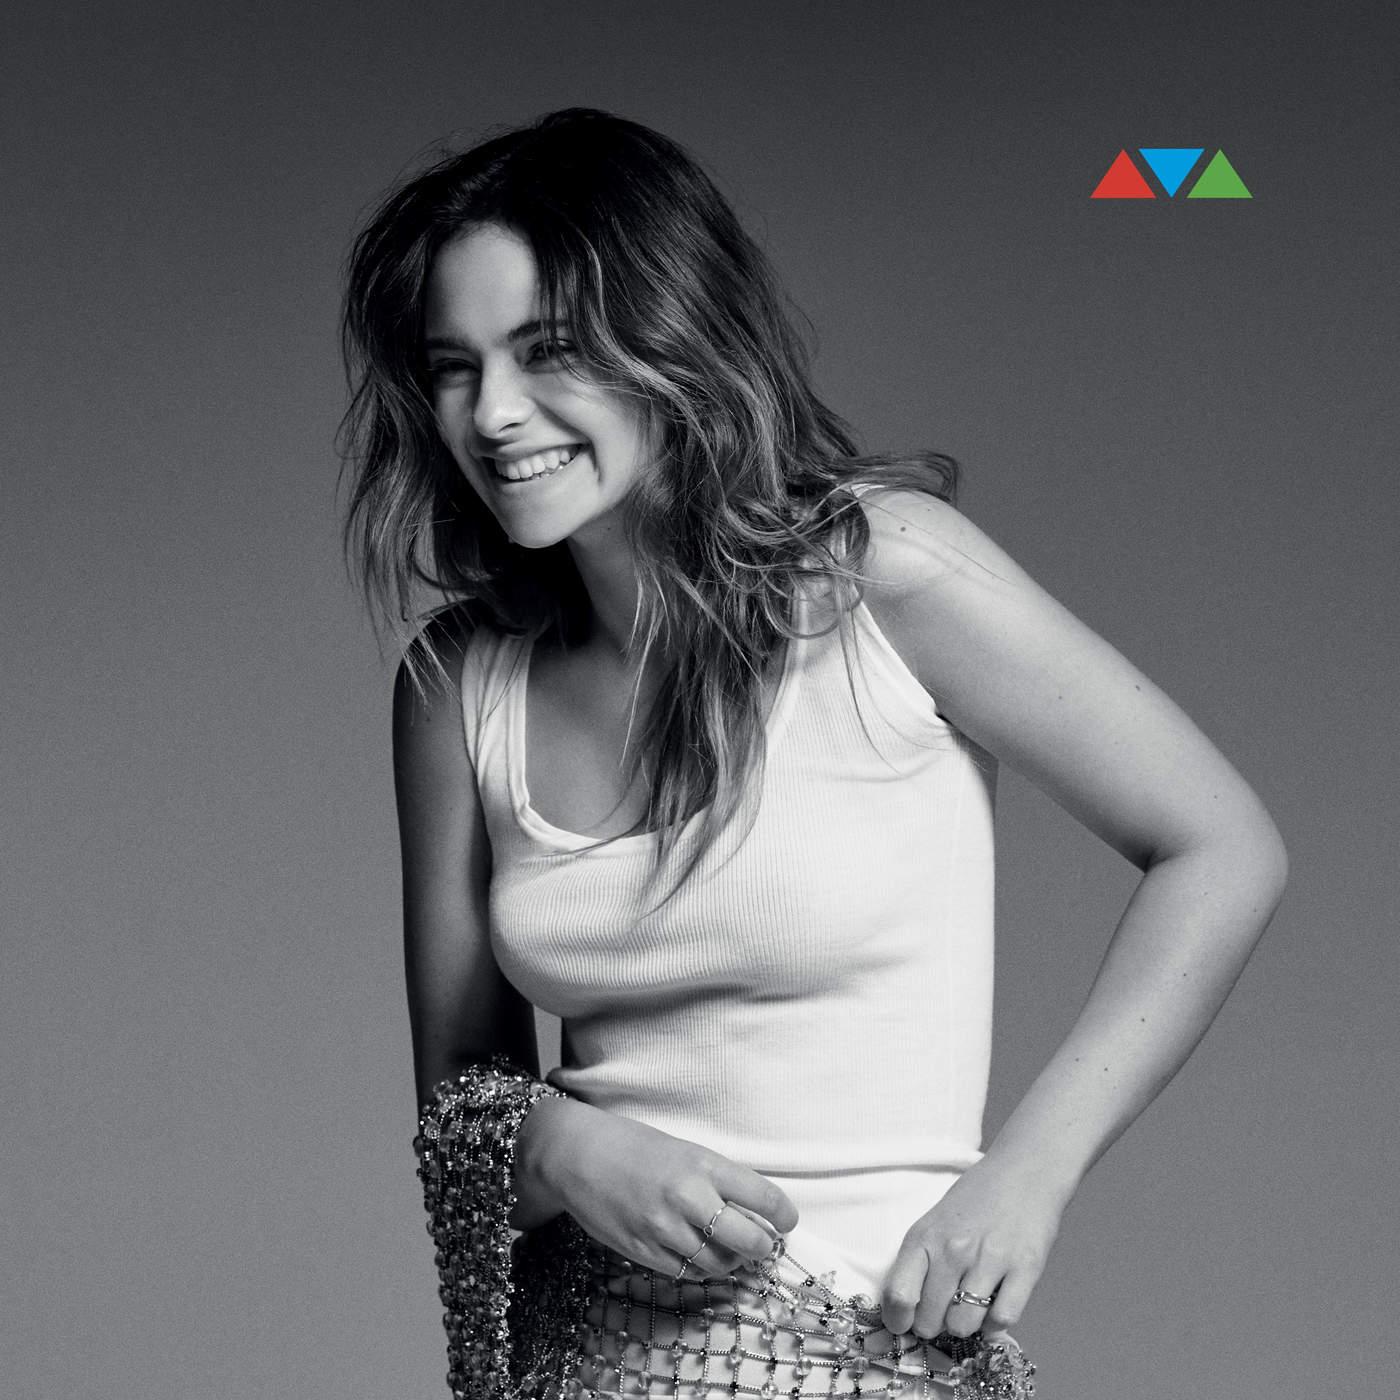 2640 - New Song: Francesca Michielin - Vulcano